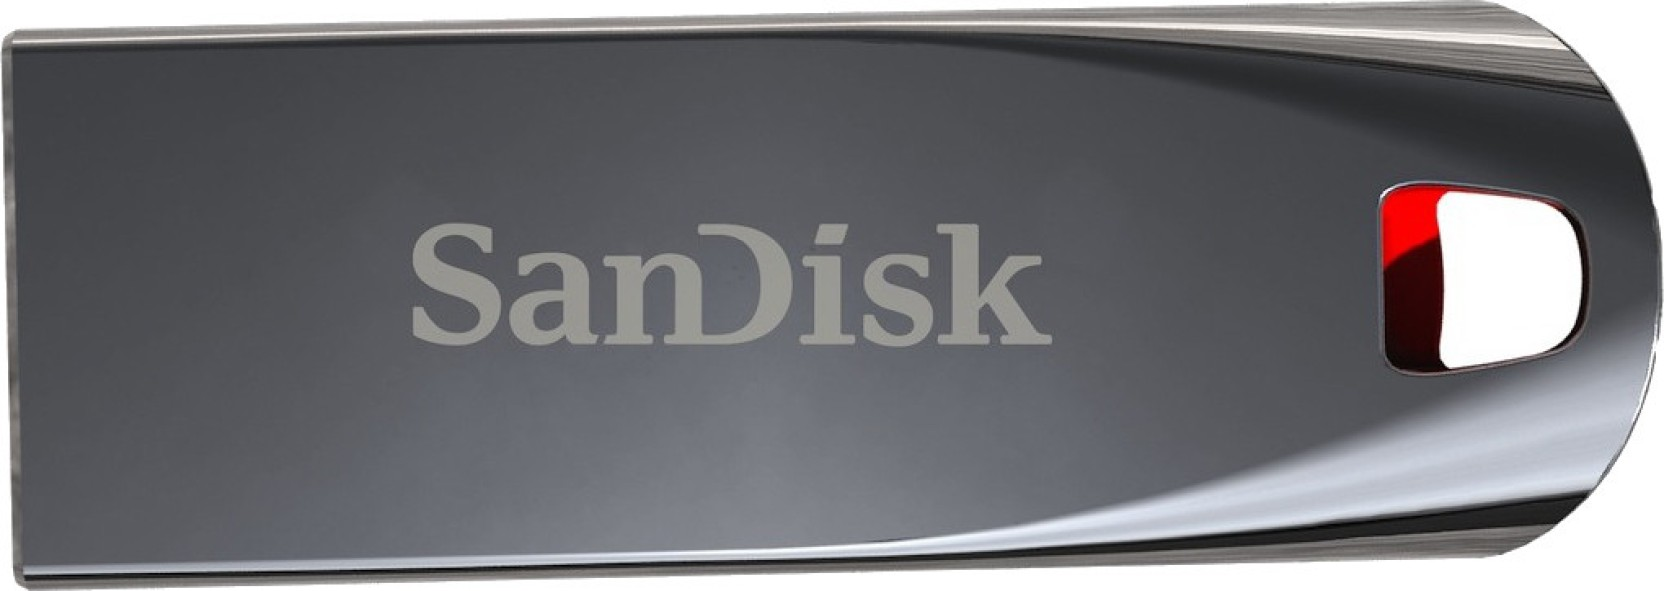 Sandisk Cruzer Force Sdcz71 016g B35 Usb 16 Gb Utility Pendriv Flashdisk 8 Cruizer Cz71 On Offer